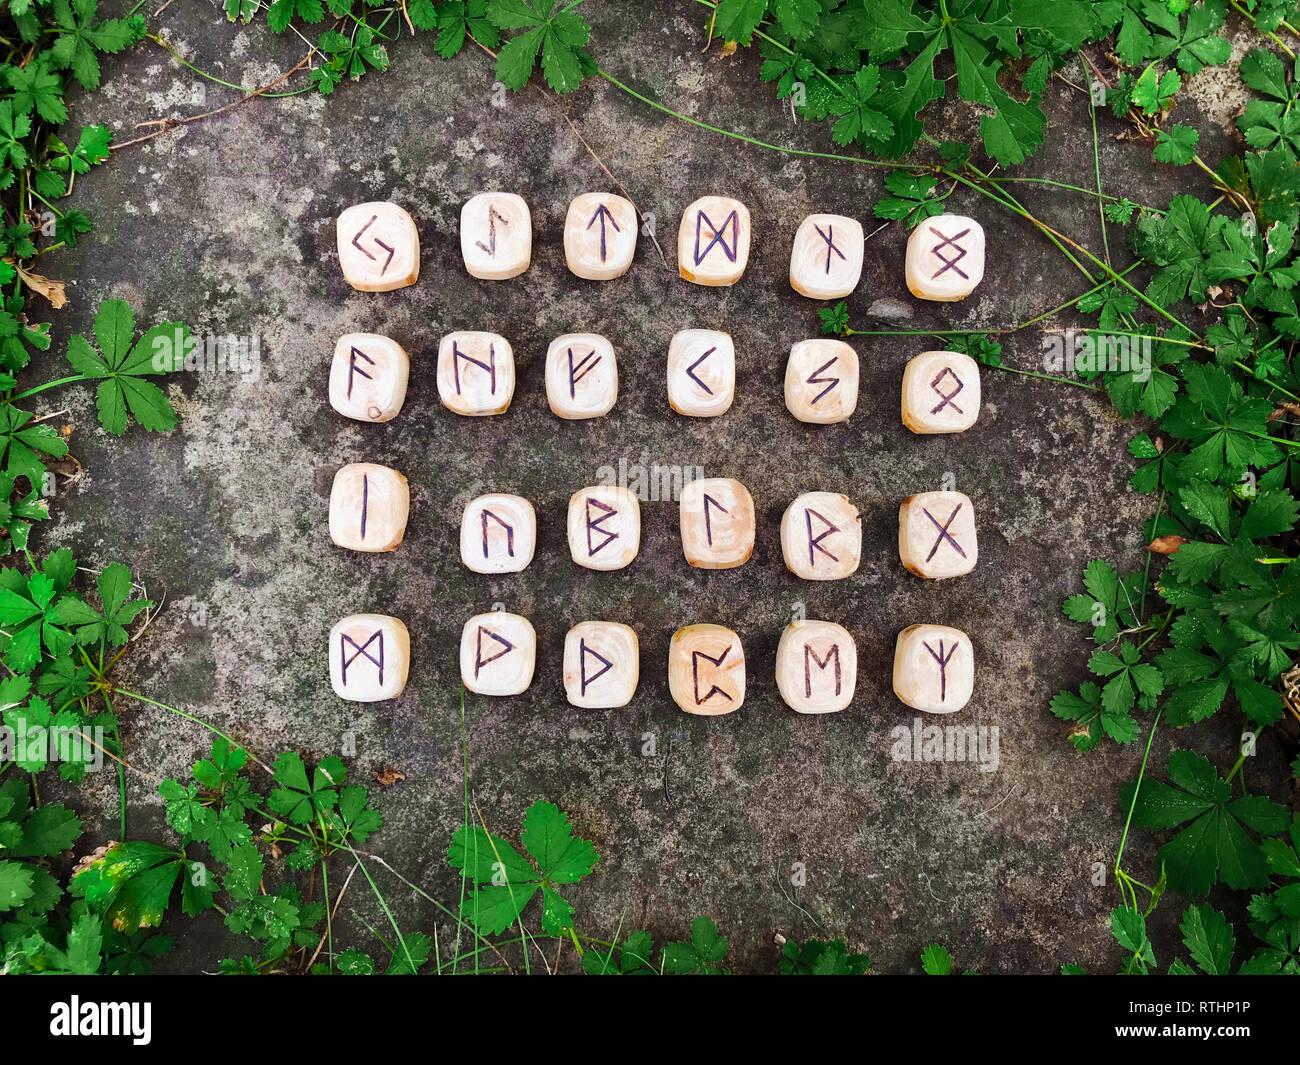 Rune Fabrik 4 dating nicknames